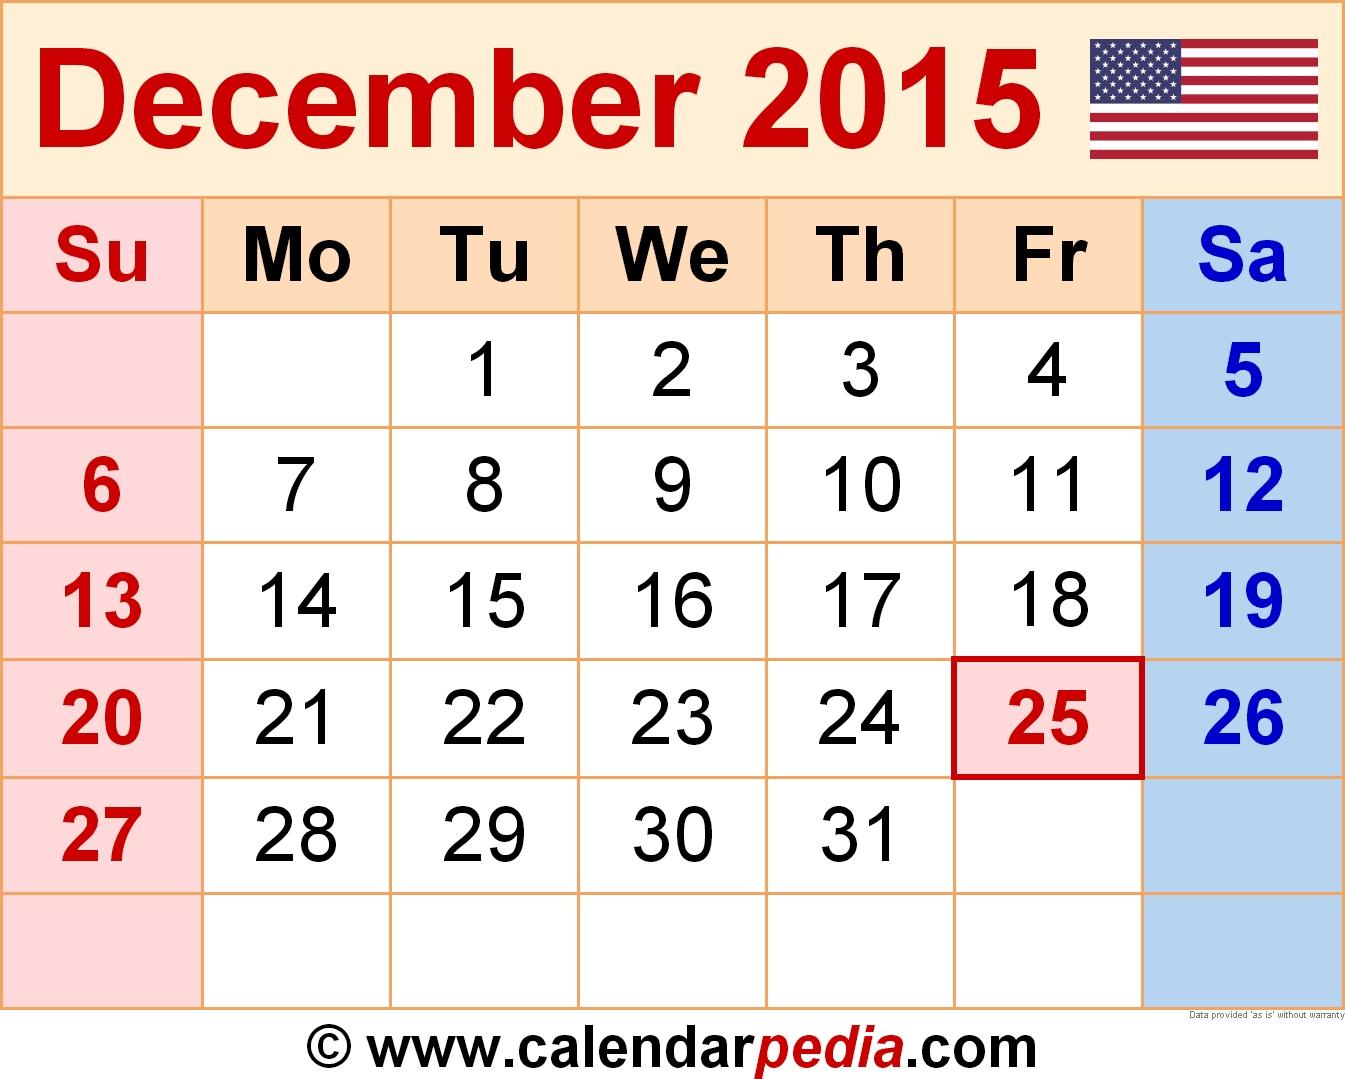 December 2015 Calendars For Word, Excel & Pdf in Fillable Monthly Calendar December 2015